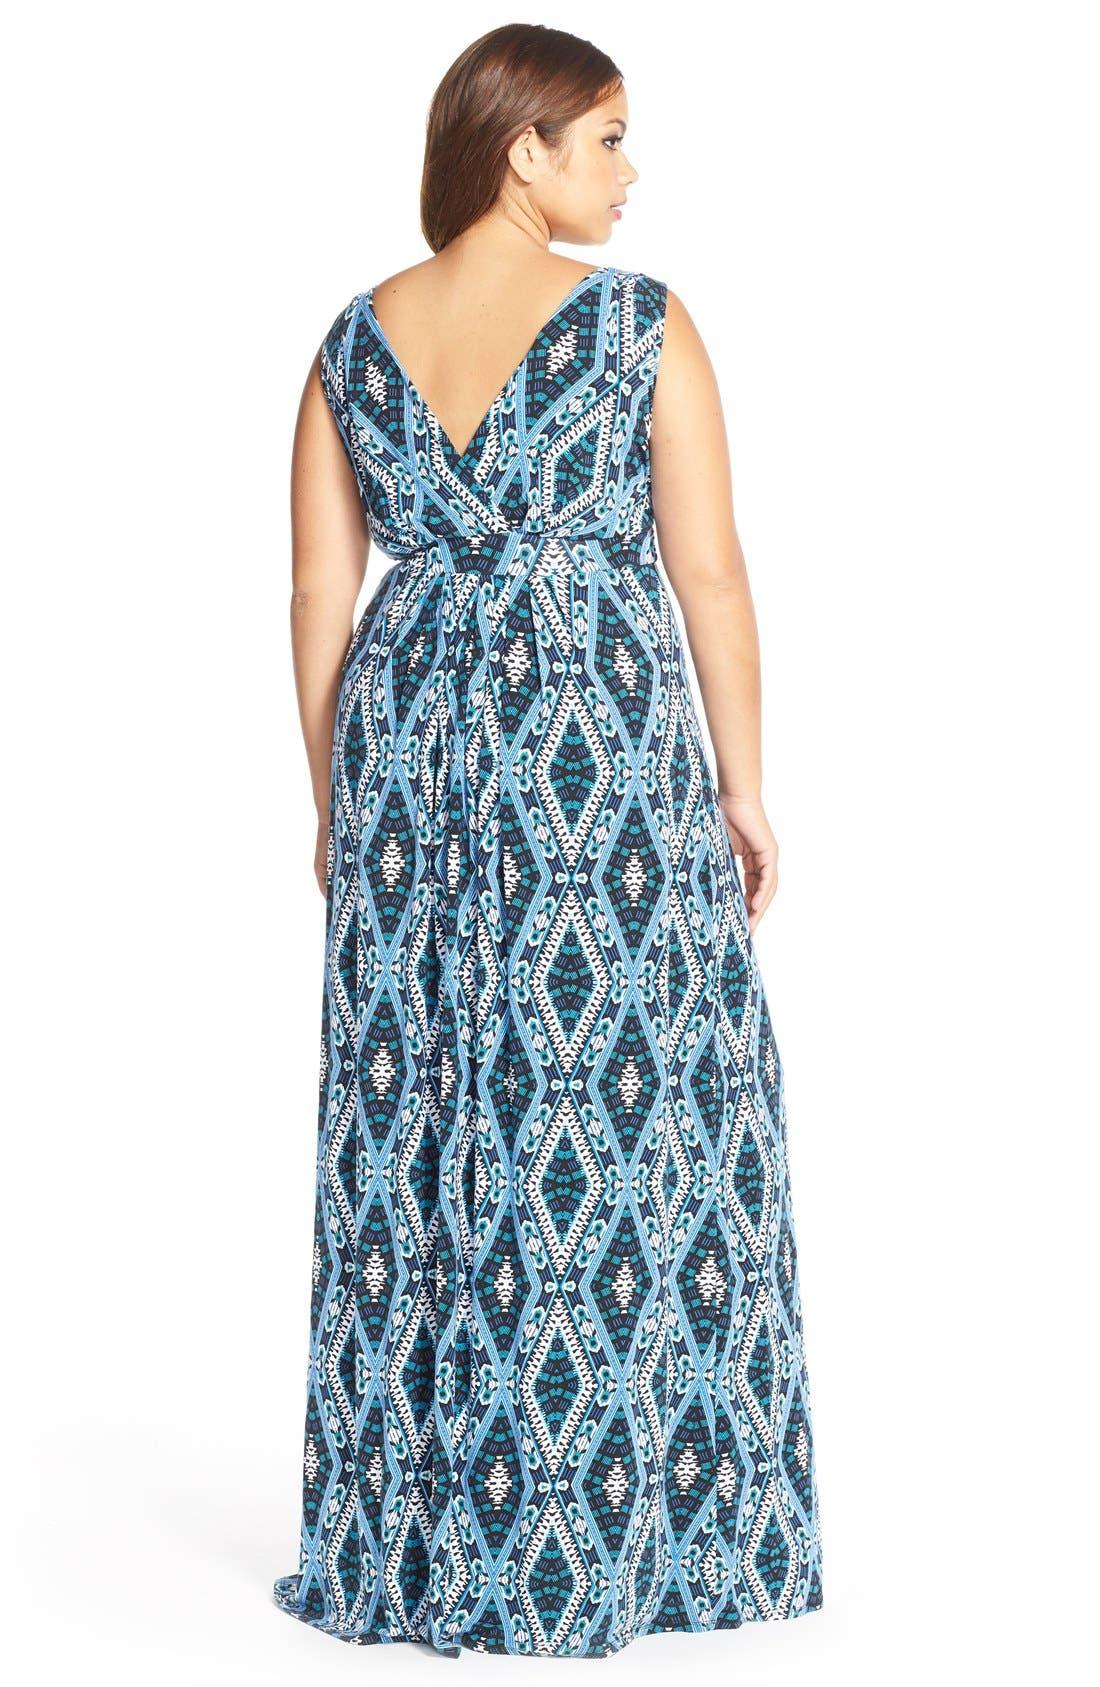 Chloe Empire Waist Maxi Dress,                             Alternate thumbnail 31, color,